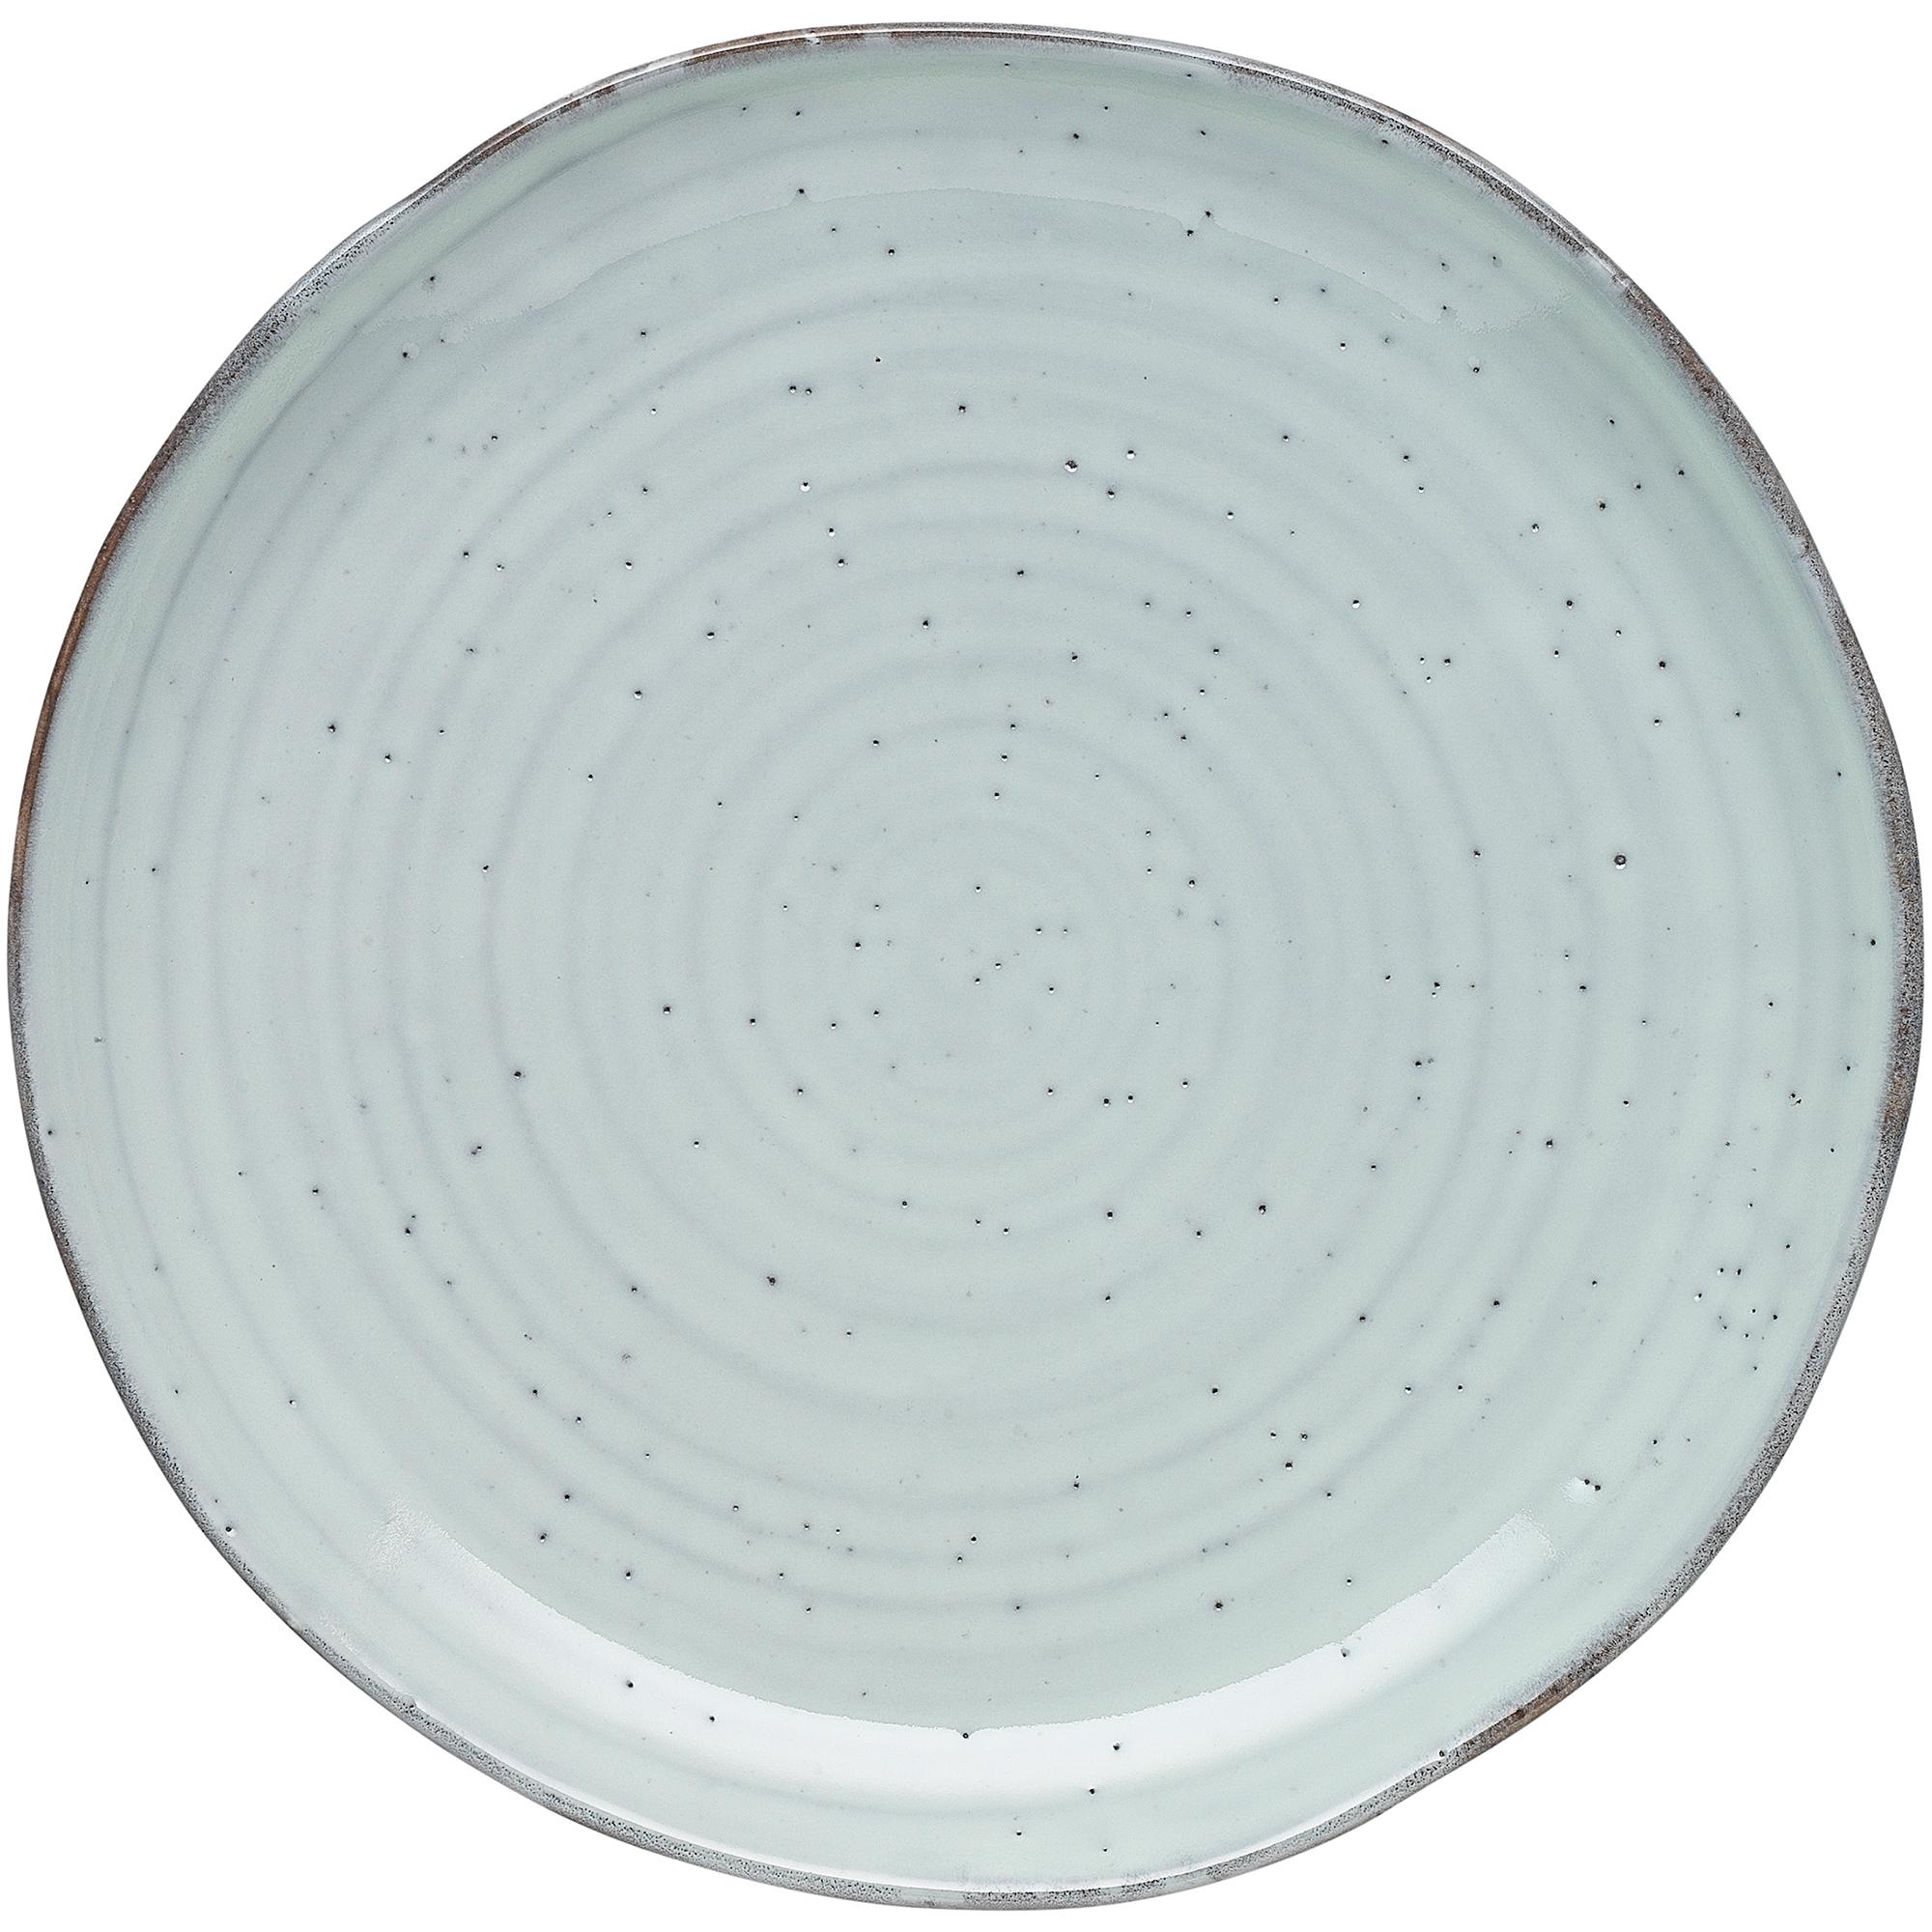 Ecology Lichen Ottawa Dinner Plates Temple Webster